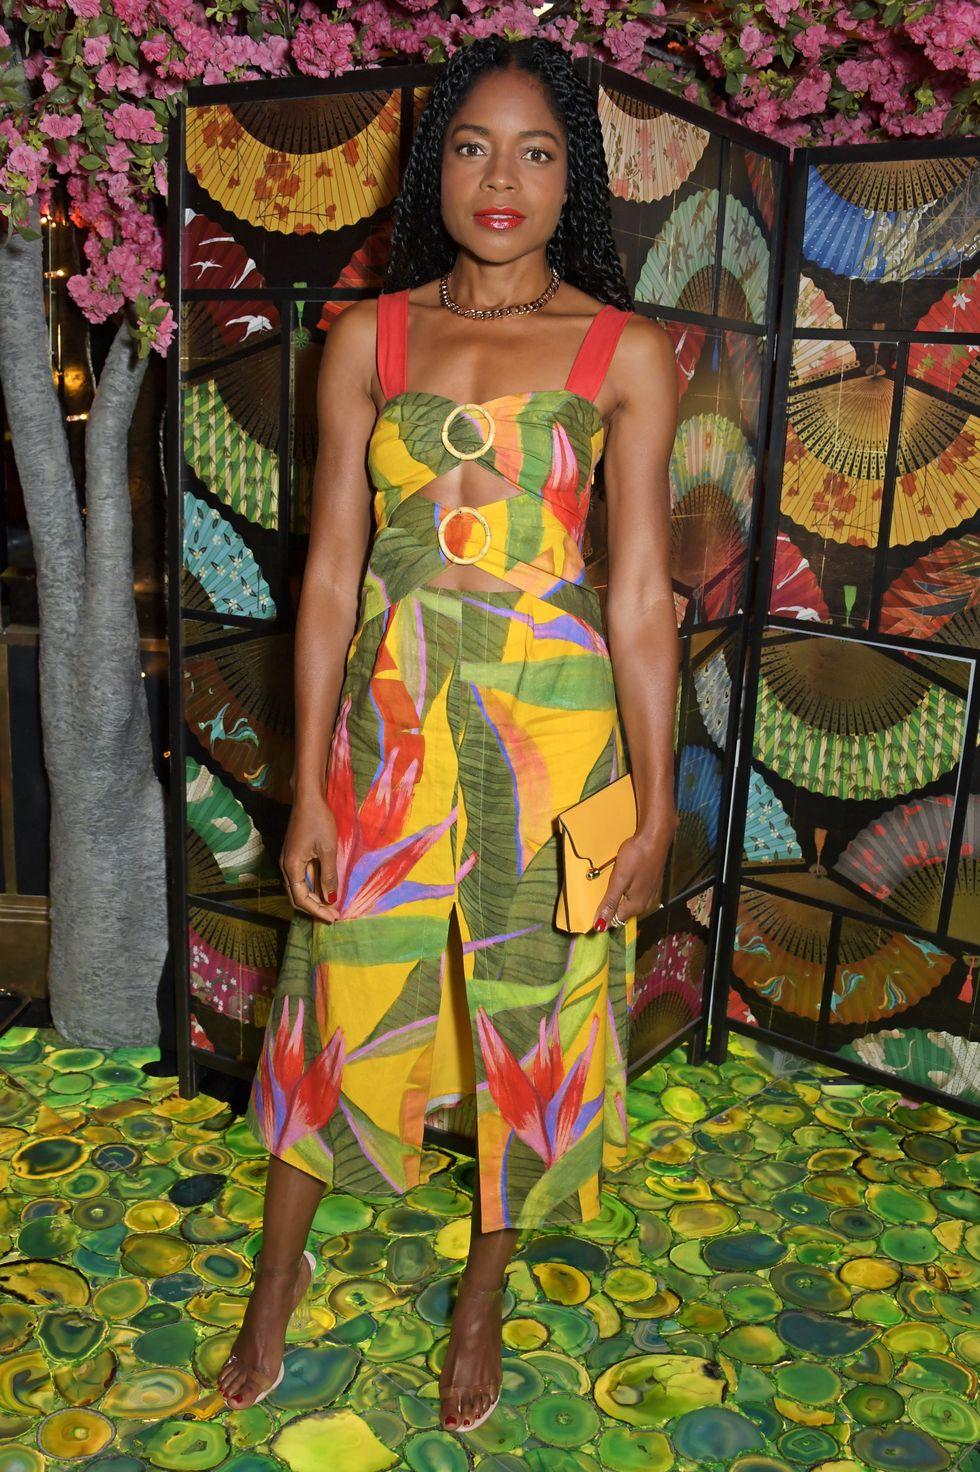 naomie-harris-wore-multi-coloured-l-print-dress-ivy-asia-chelsea-launch